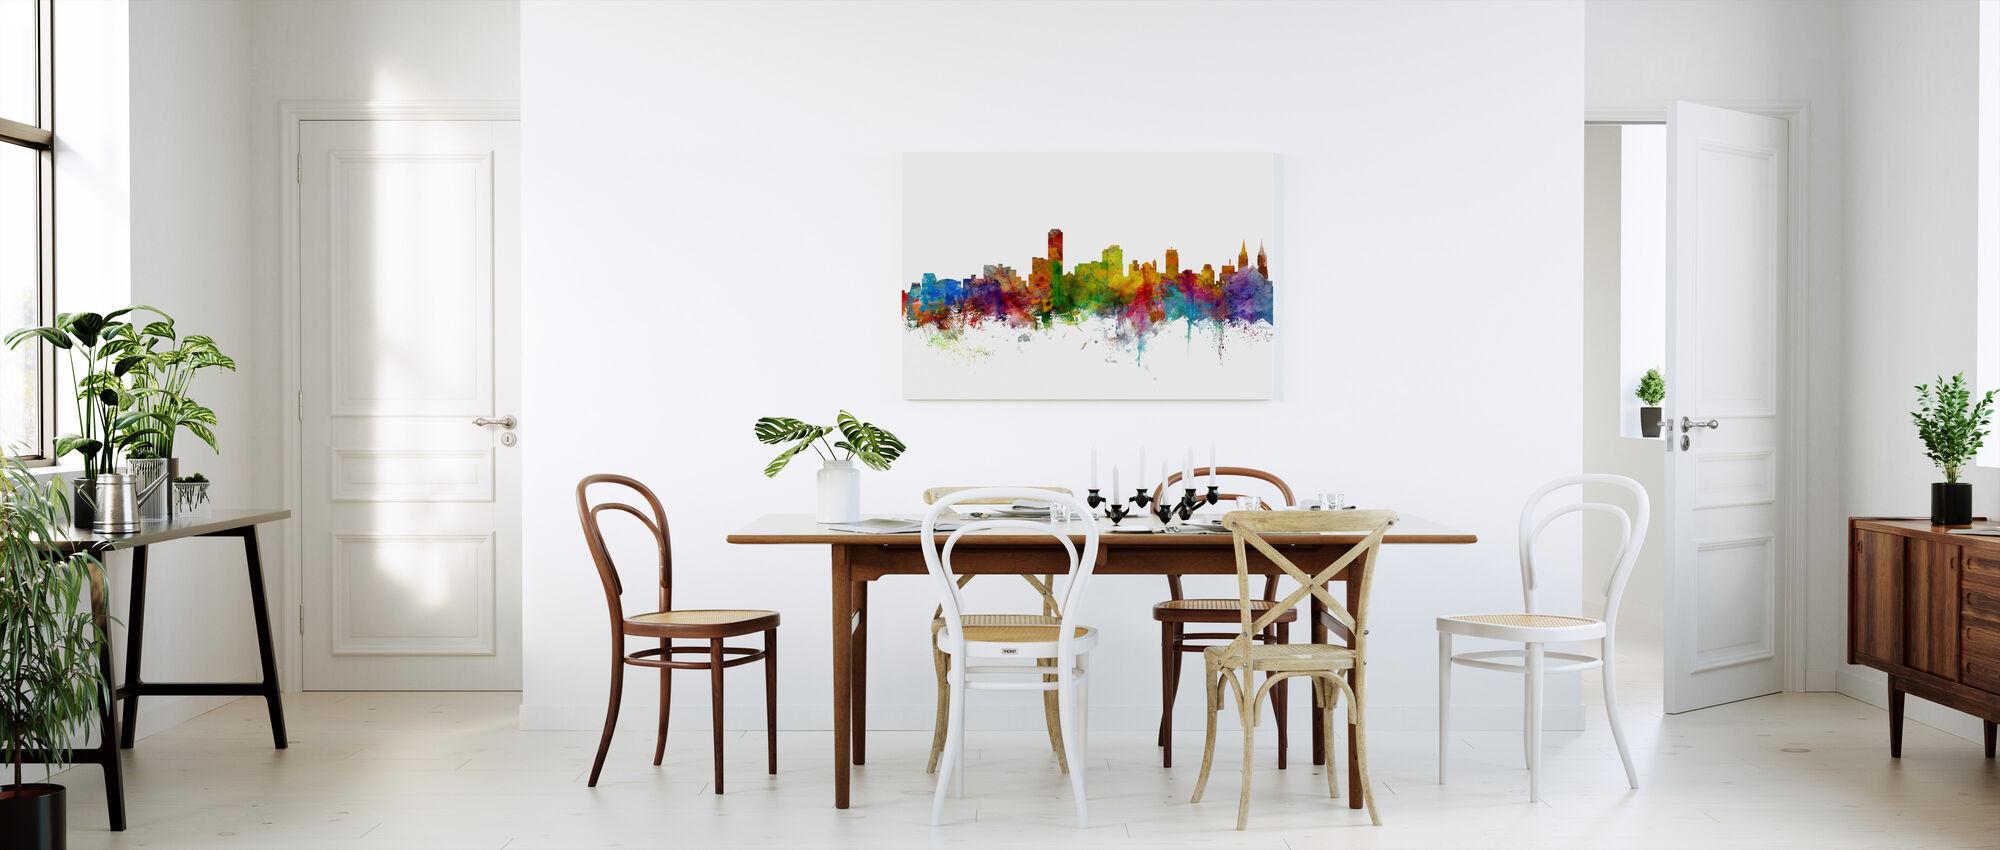 Skyline van Adelaide Australië - Canvas print - Keuken